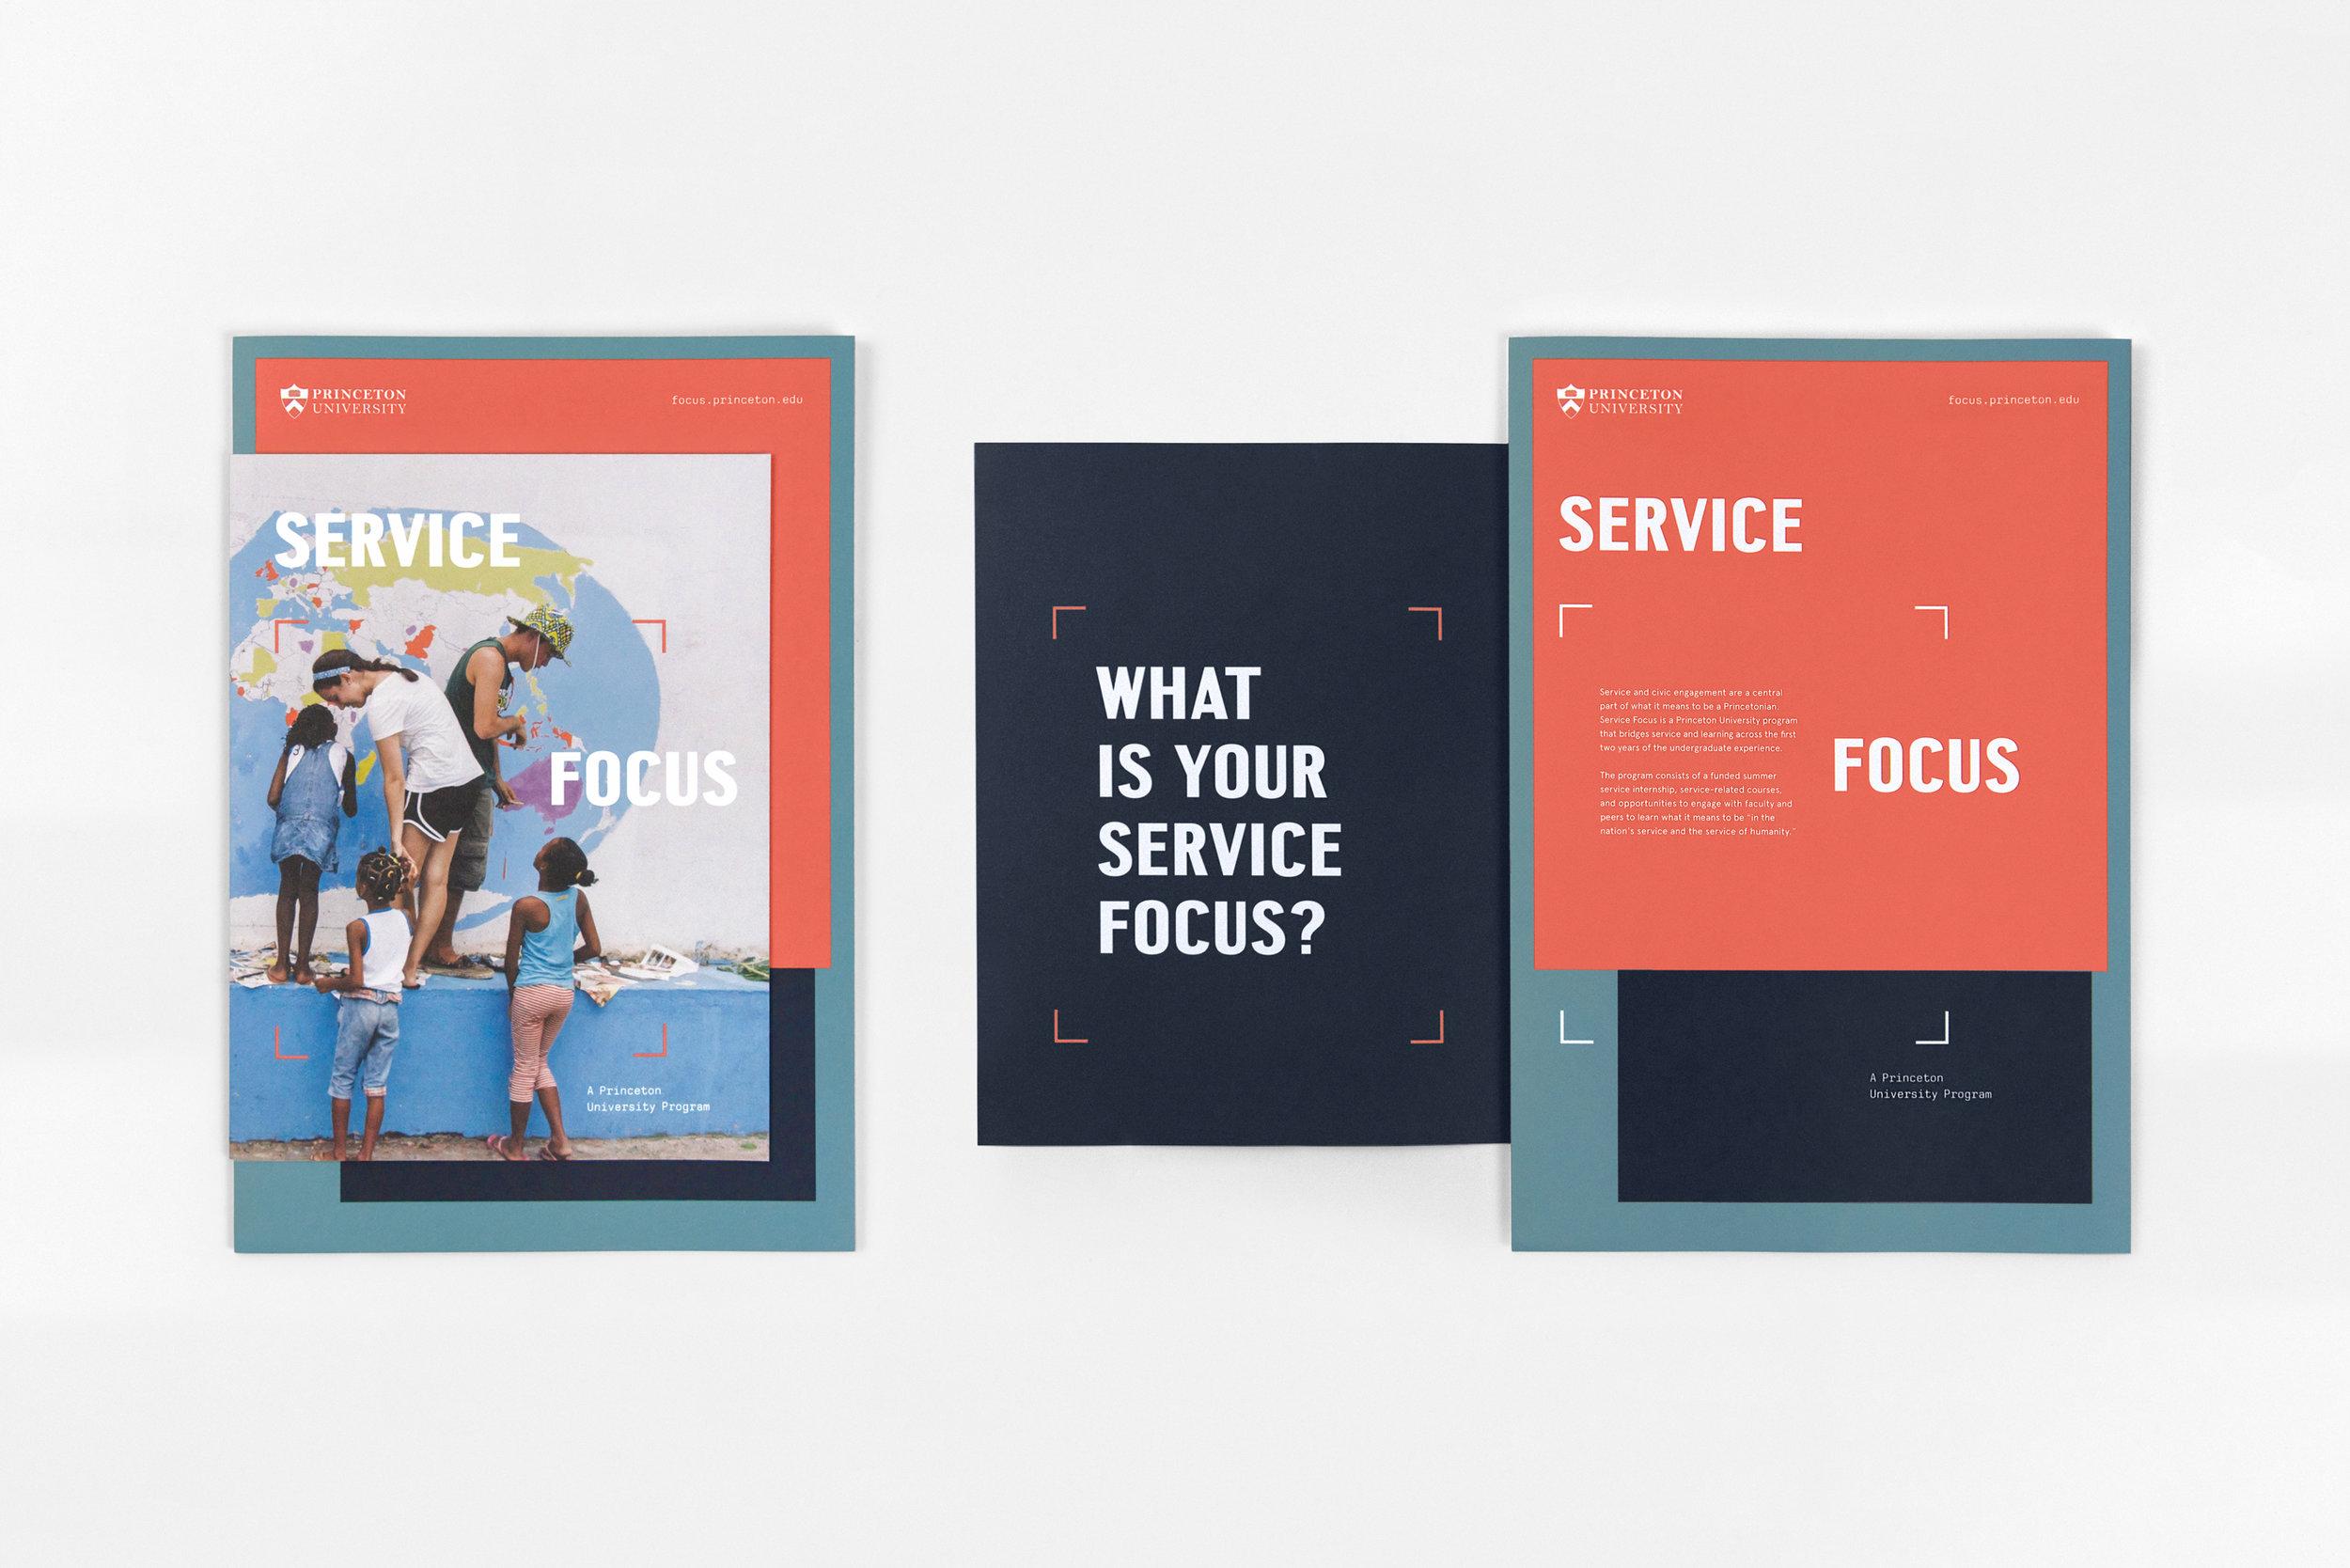 Service-Focus_3_1.jpg